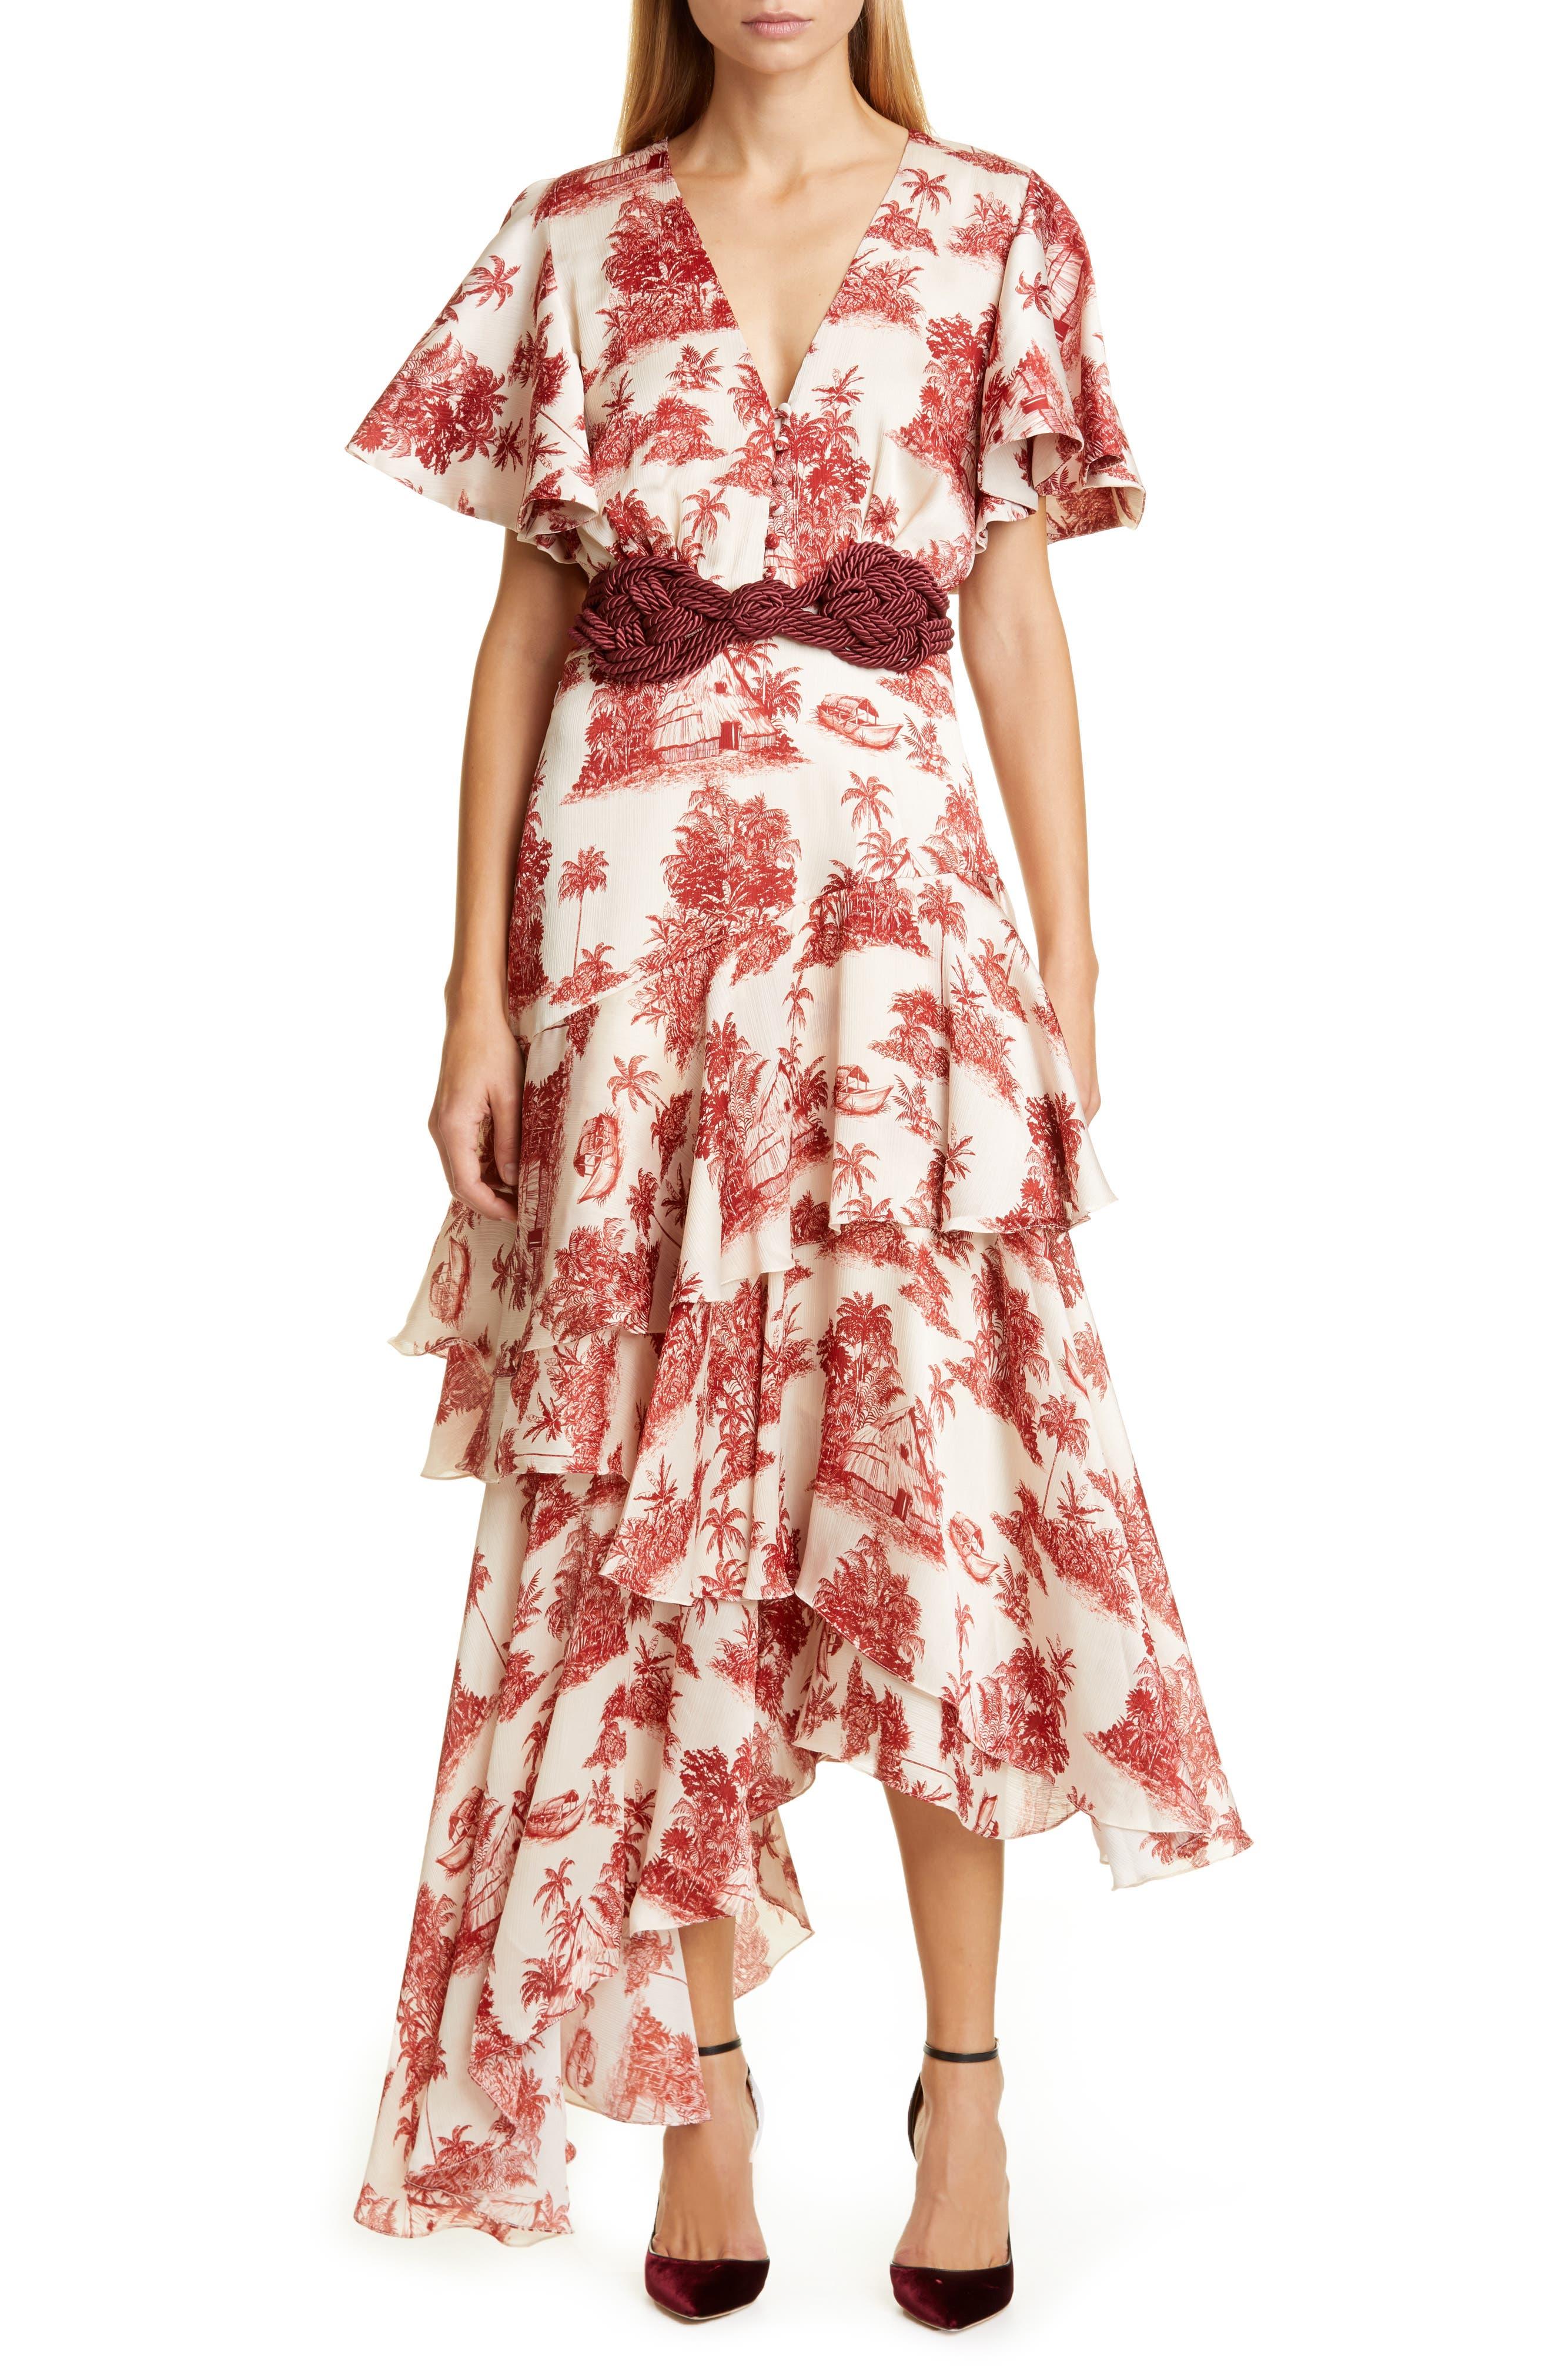 Johanna Ortiz Dresses Toile Palm Print Asymmetrical Georgette Midi Dress